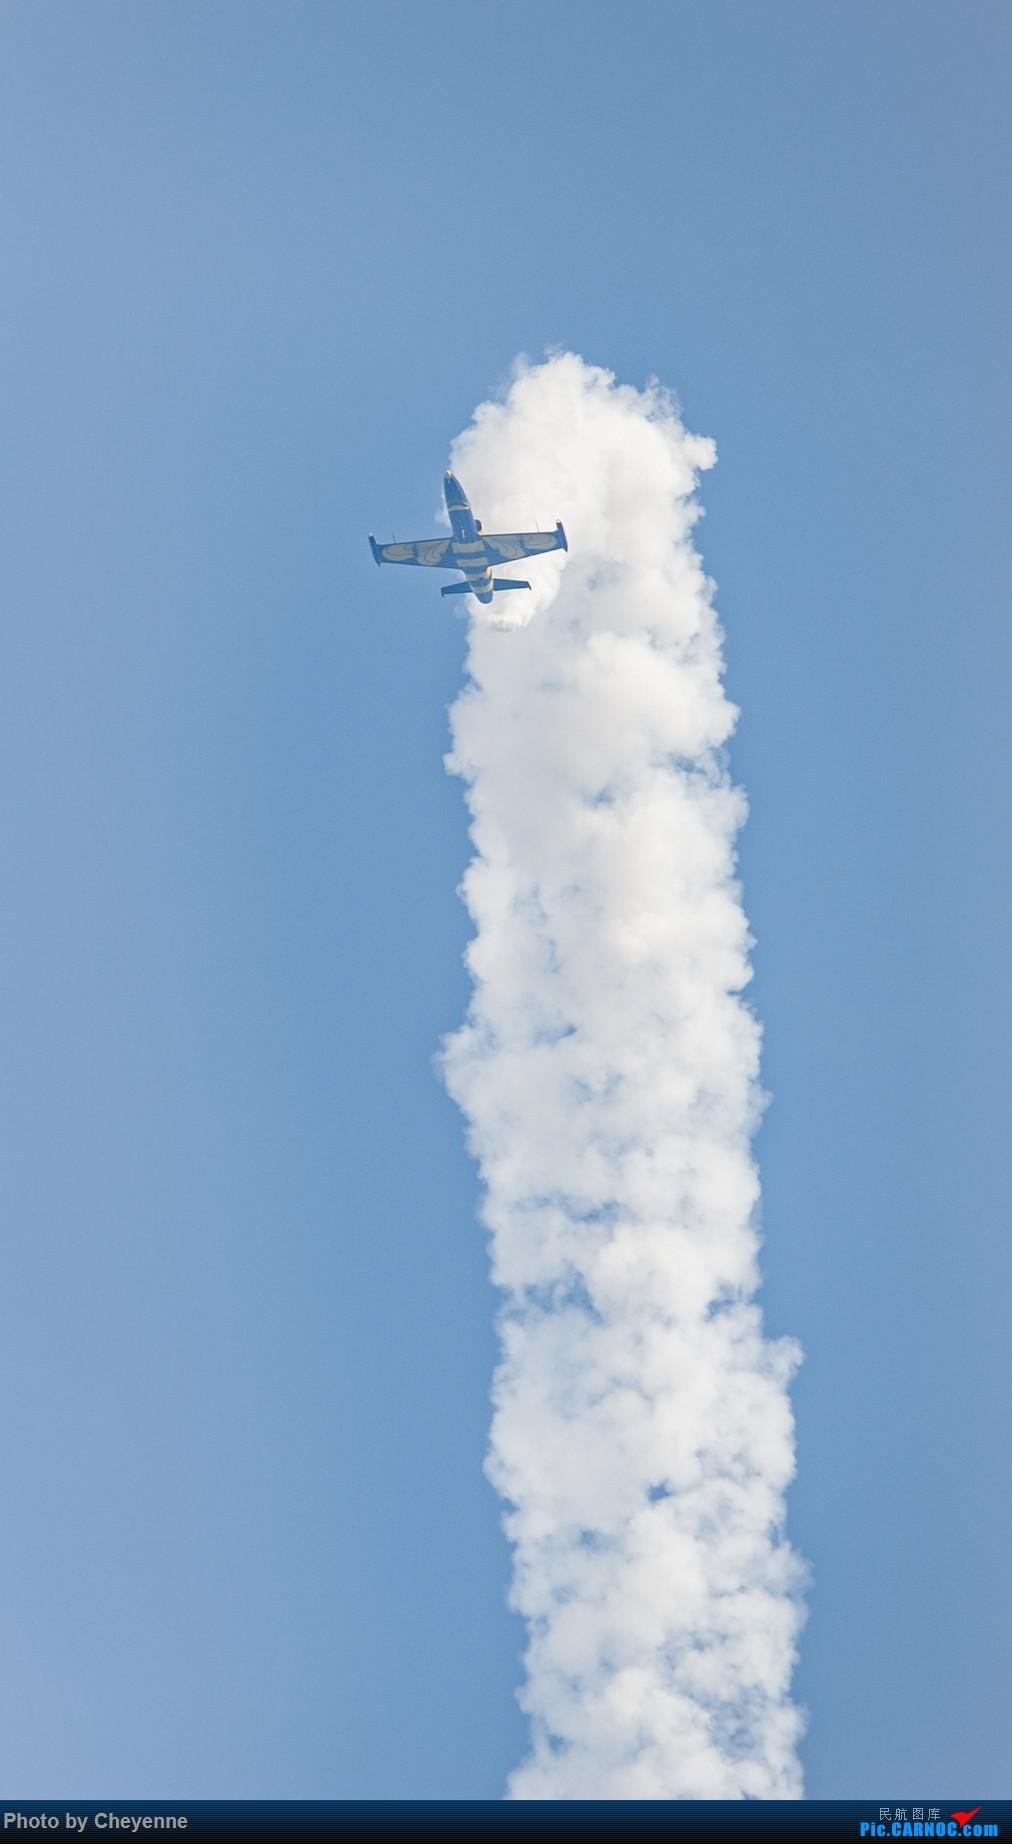 Re:[原创]外面遛遛就好,瞅瞅可爱的华约小蜜蜂 AERO L-39C ALBATROS YL-KSL 中国广汉机场